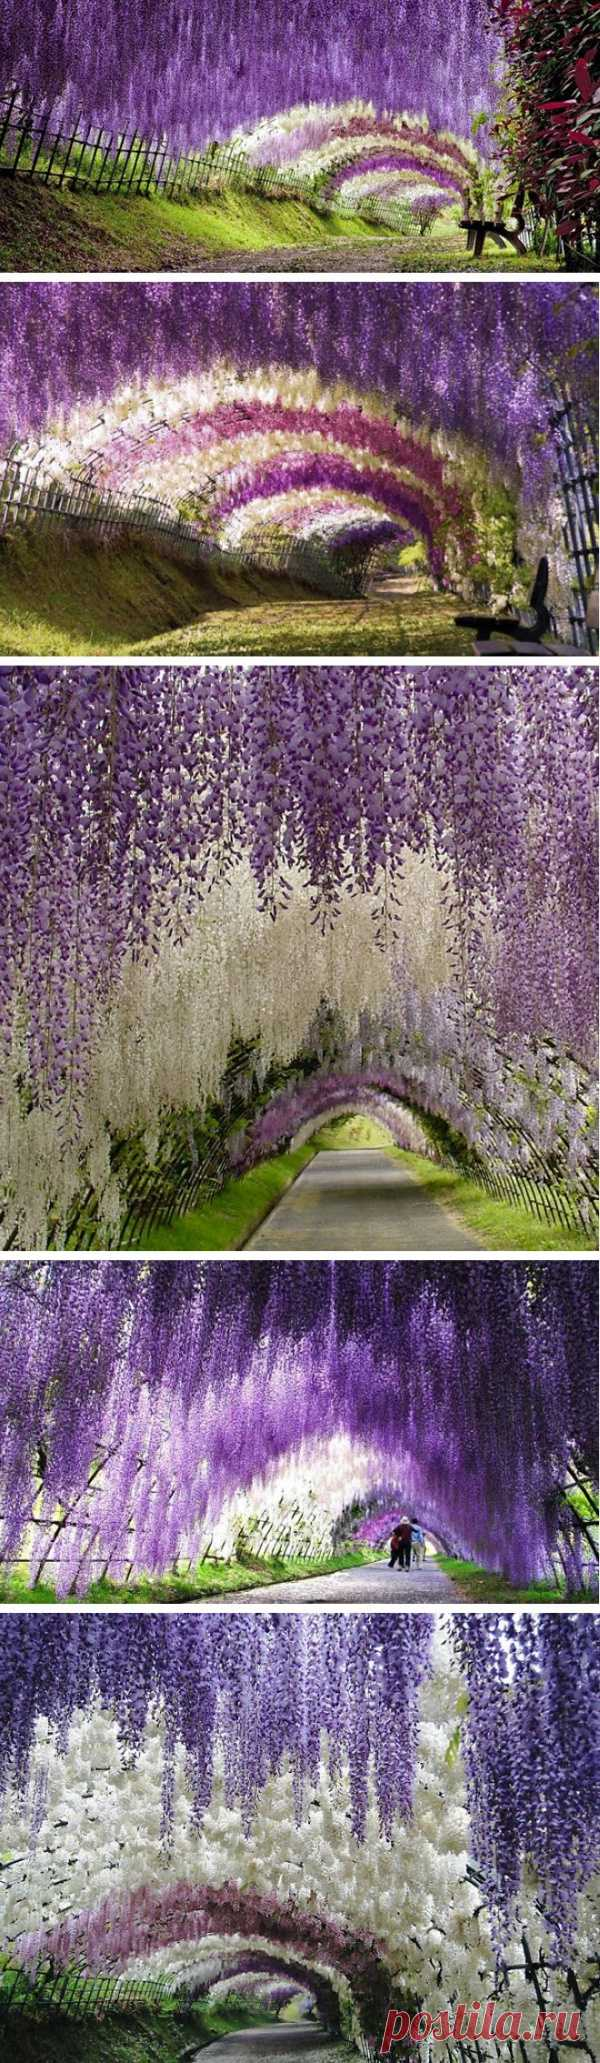 Тоннель из цветов! Висячий сад цветов Кавати Фудзи, Япония